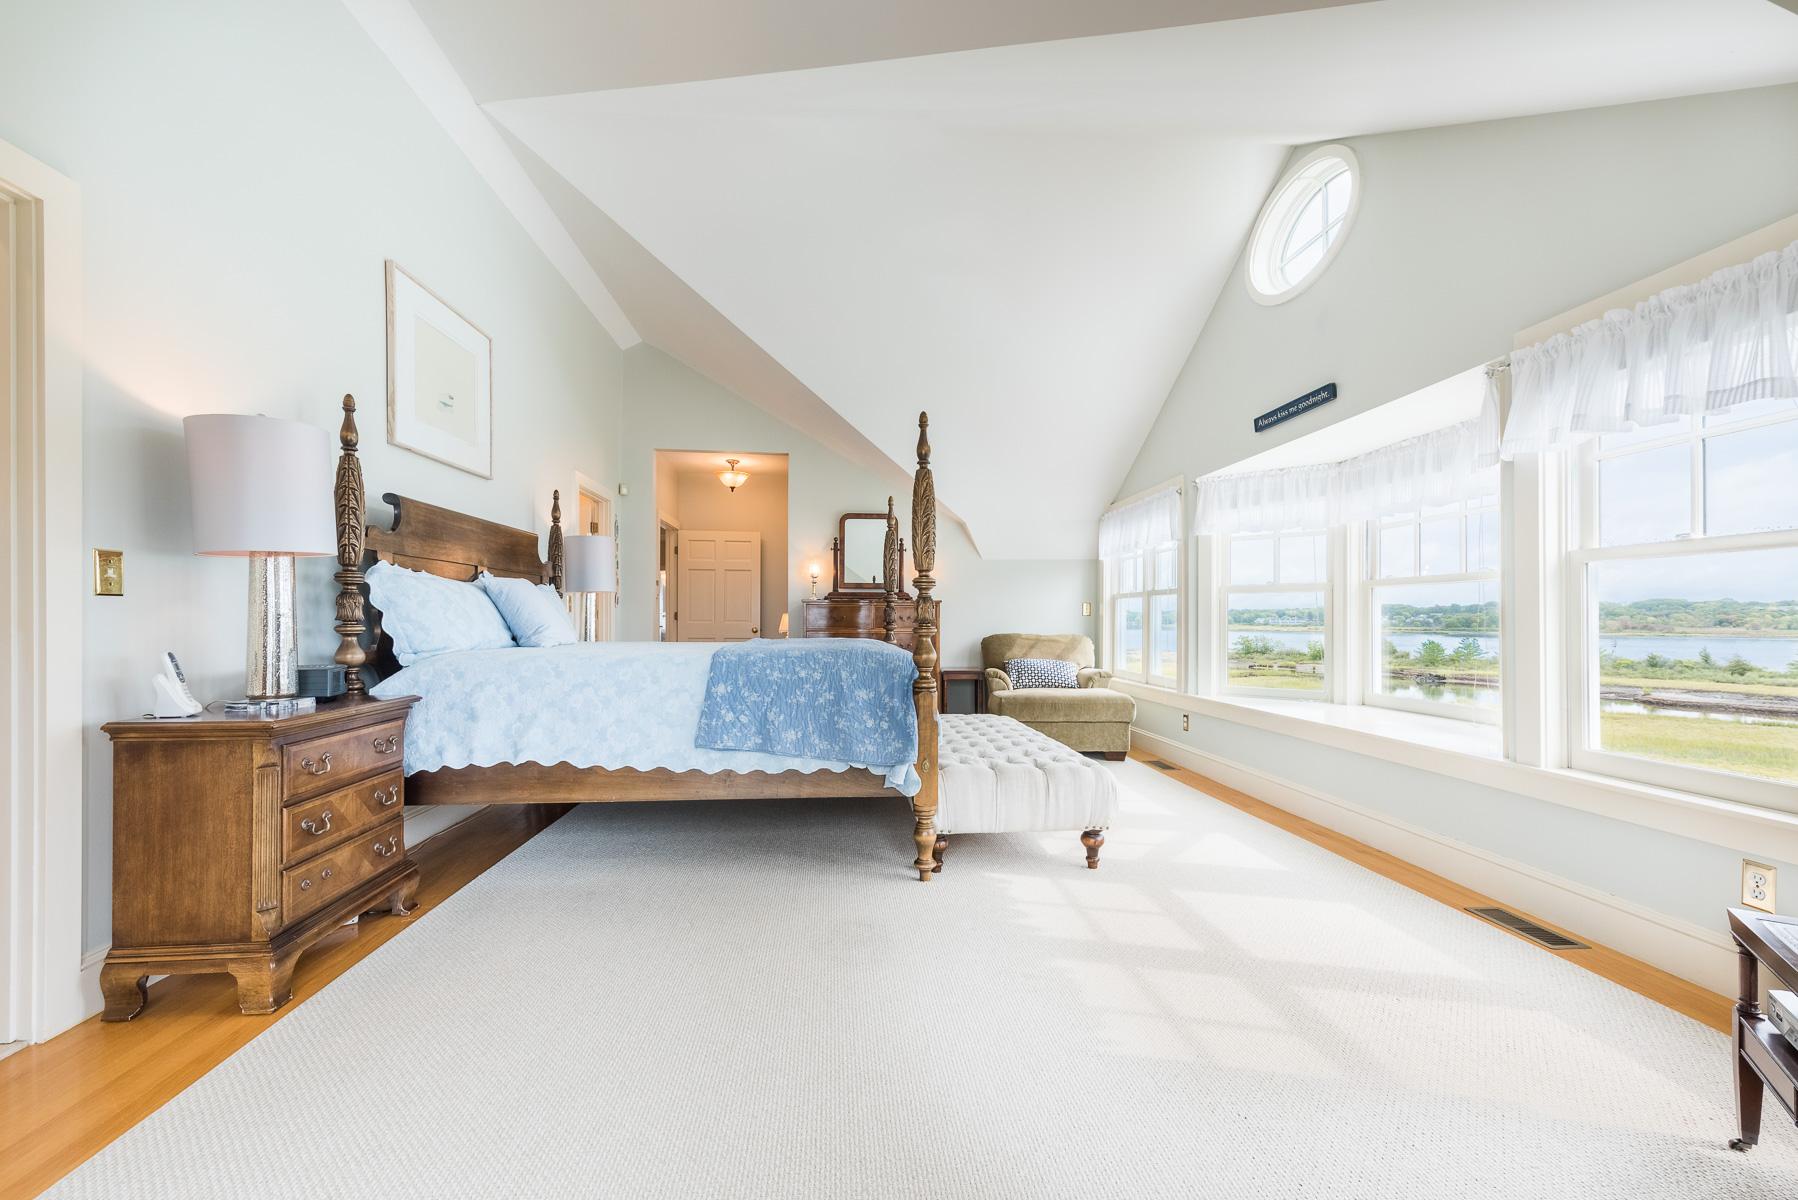 Additional photo for property listing at 24 Stone Tower Lane Barrington, R.I. 02806  Barrington, Rhode Island 02806 United States